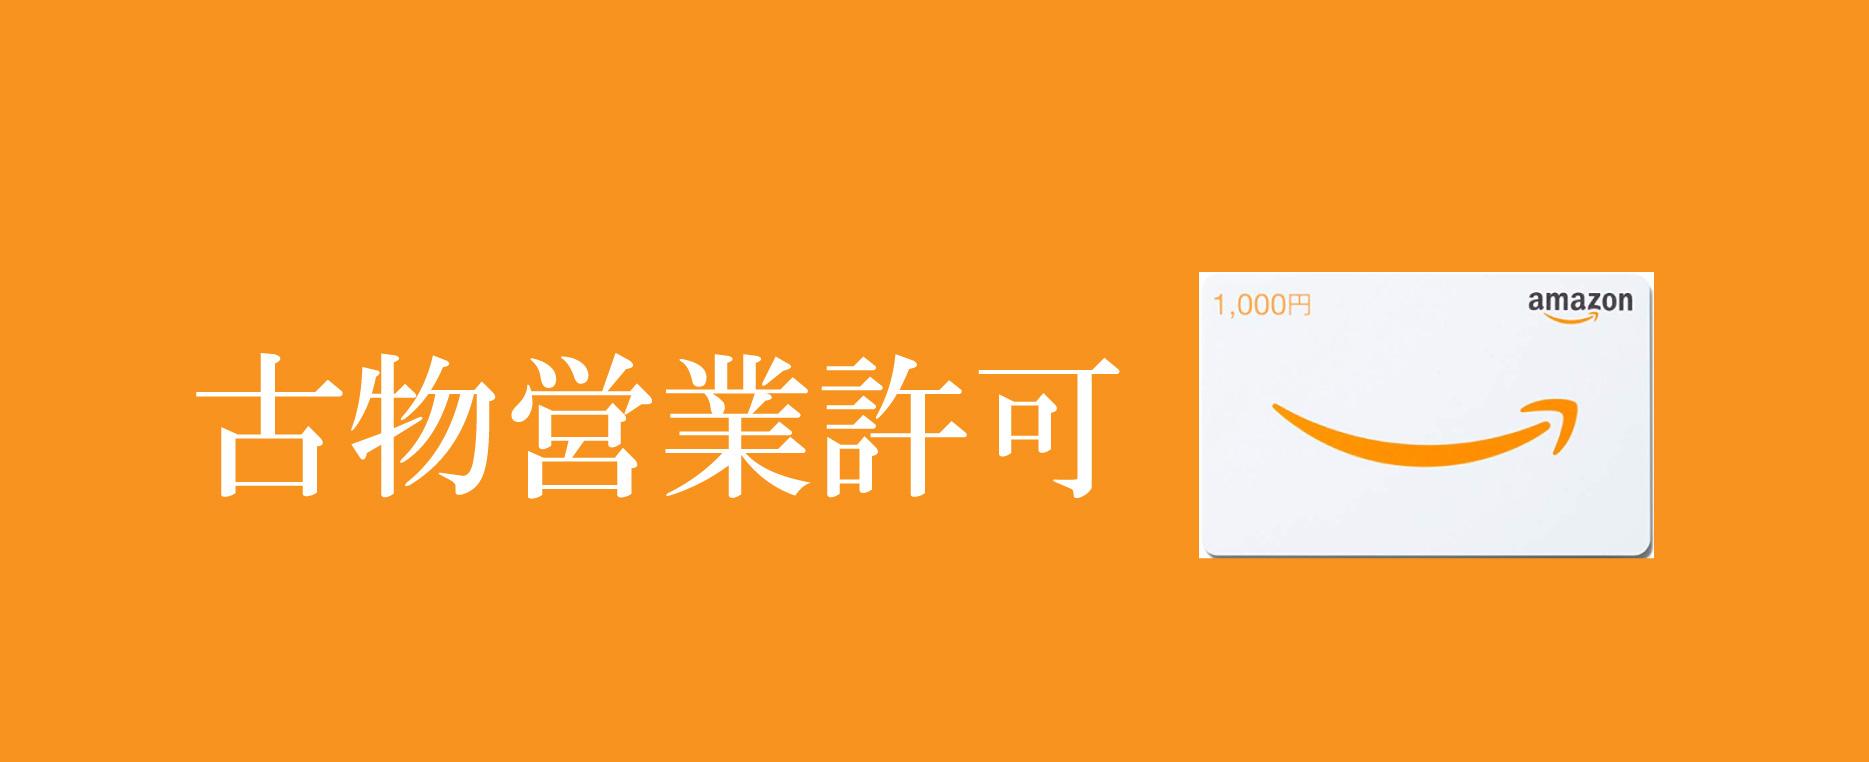 amazonギフト券の優良店を選ぶ極意6